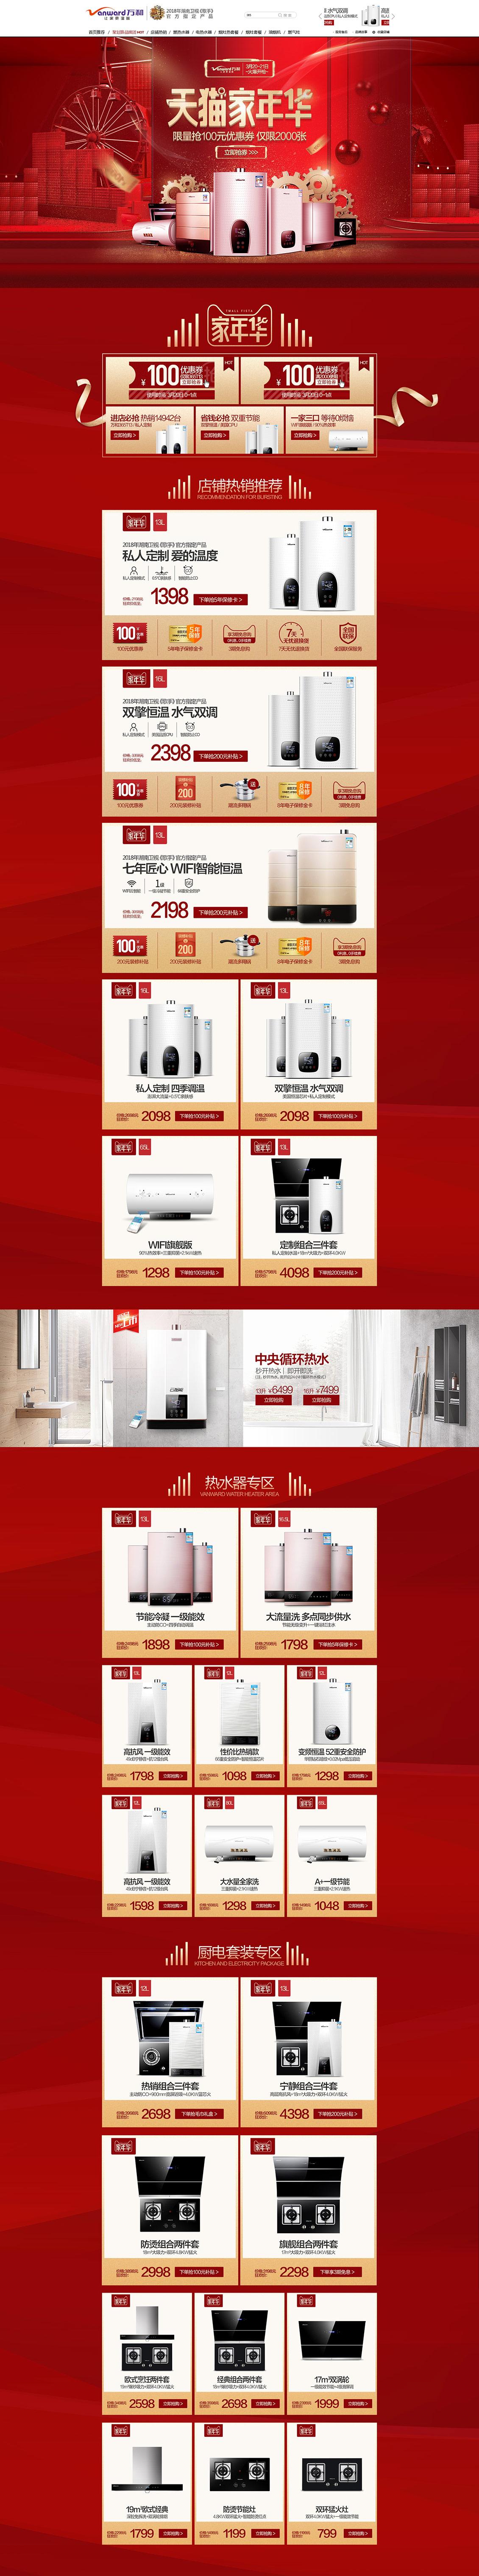 vanward万和 家电 3C数码 家用电器 家装节 家年华 天猫首页活动专题网页设计